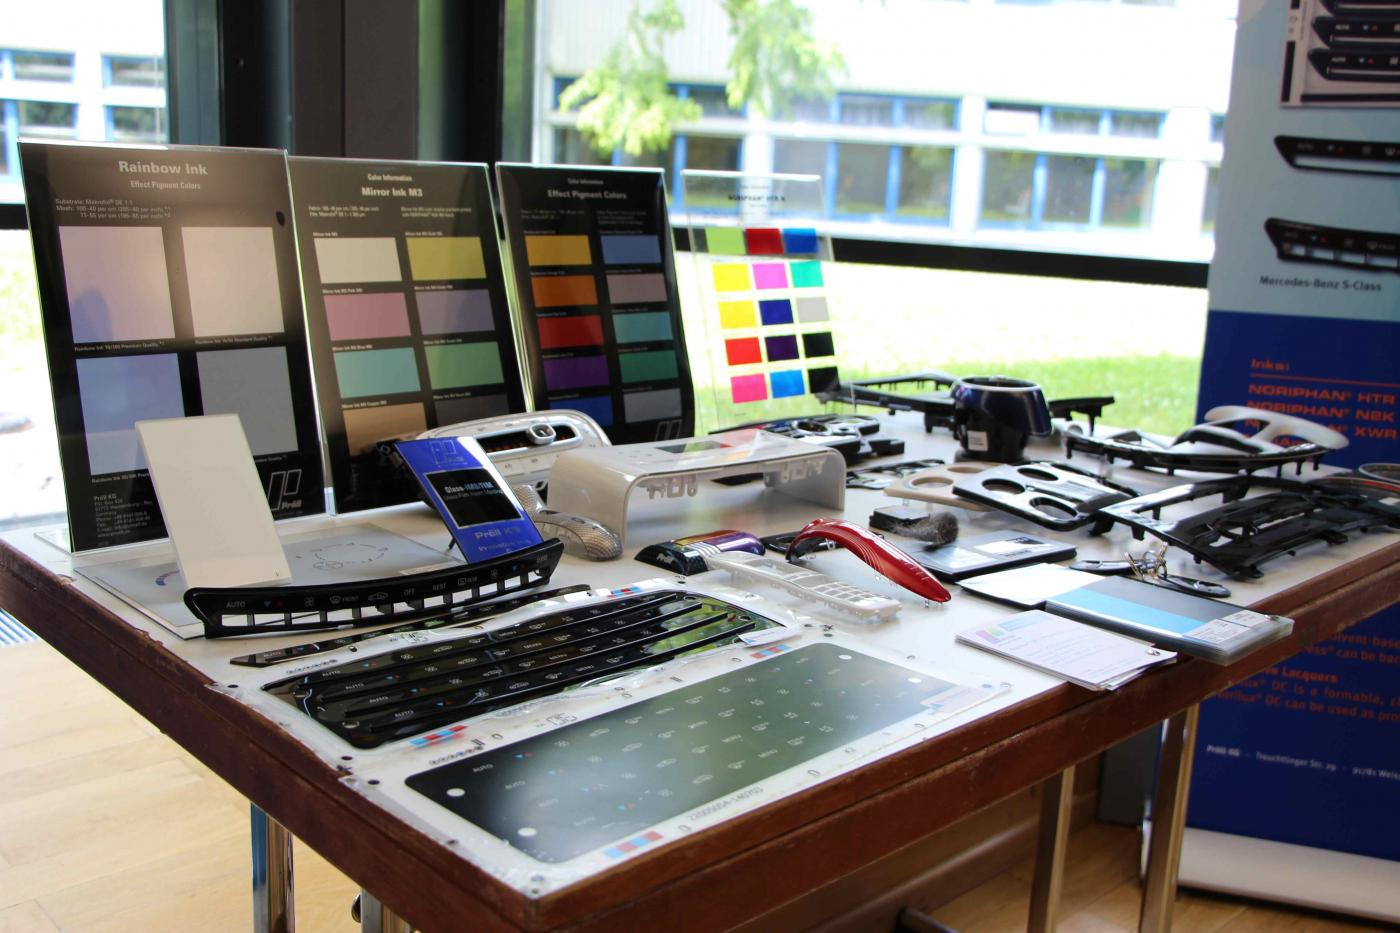 2015-07-09 Treffpunkt Kunststoff Bild 17